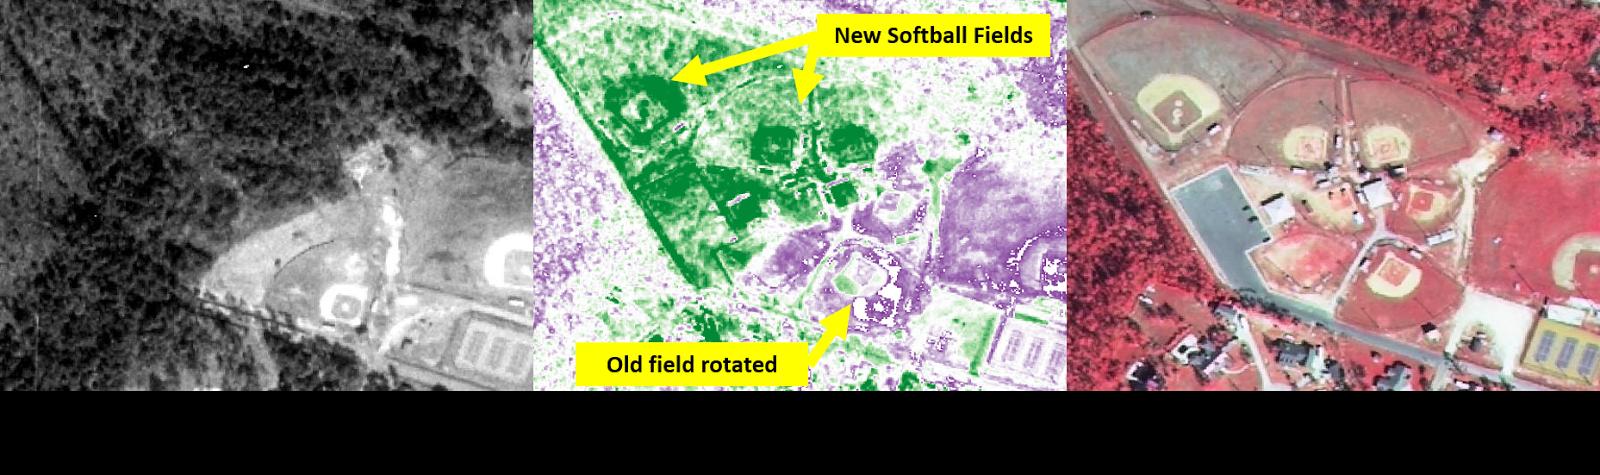 GeospatialPython com: Basic Image Change Detection in QGIS